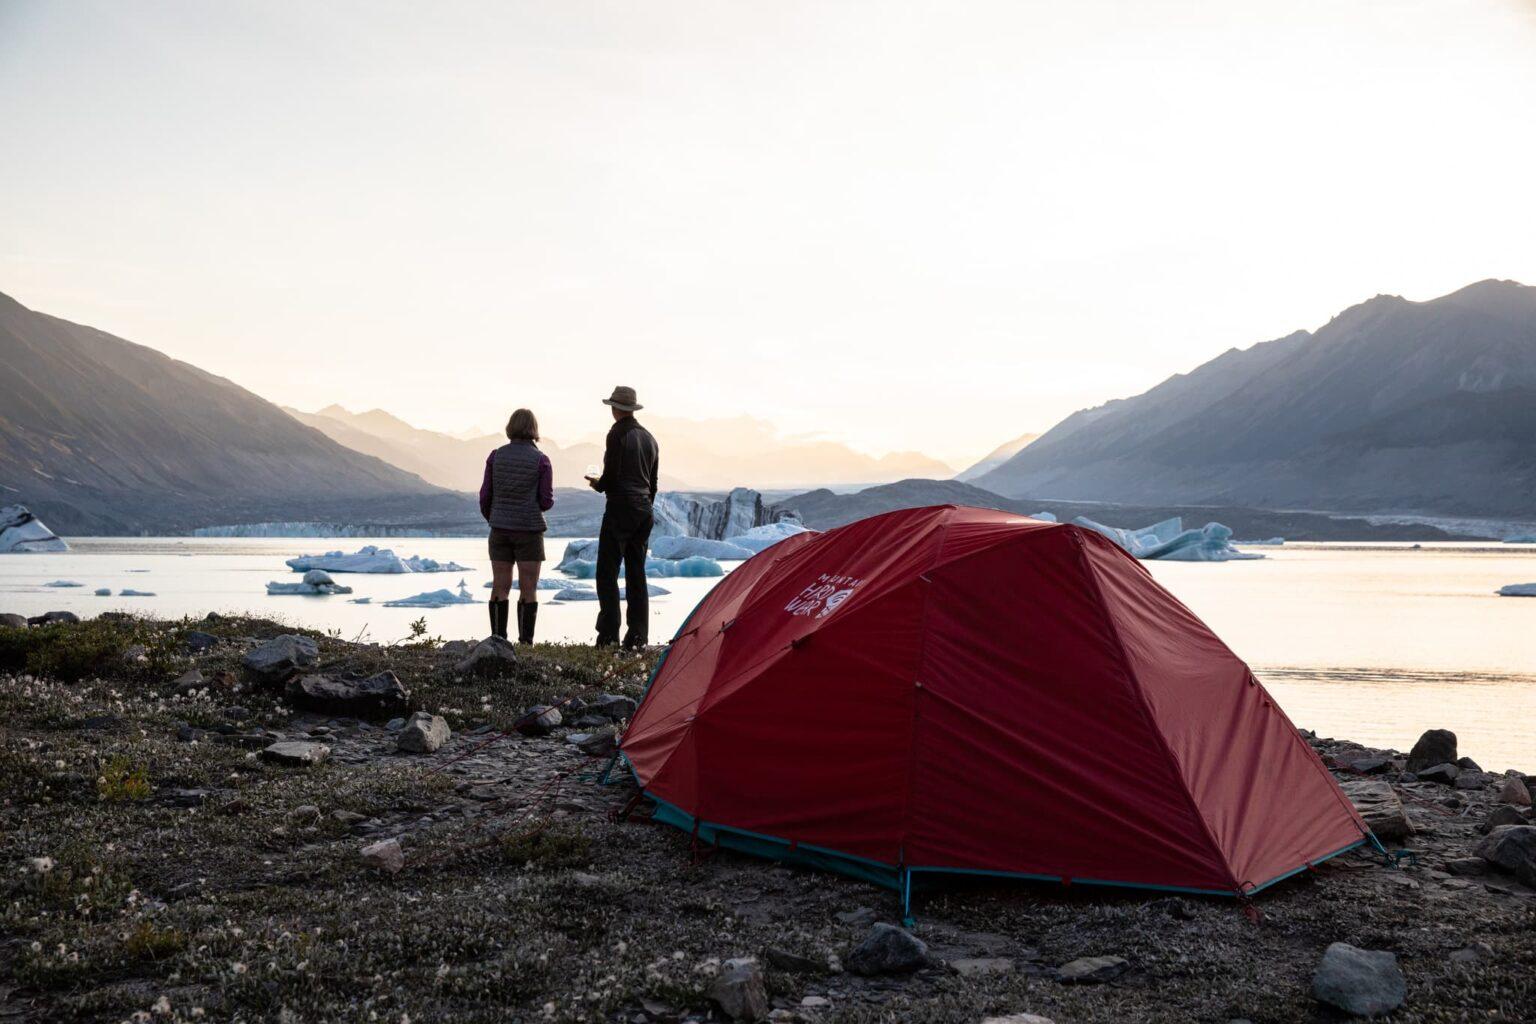 Credit: Yukon Wild / Taylor Burk